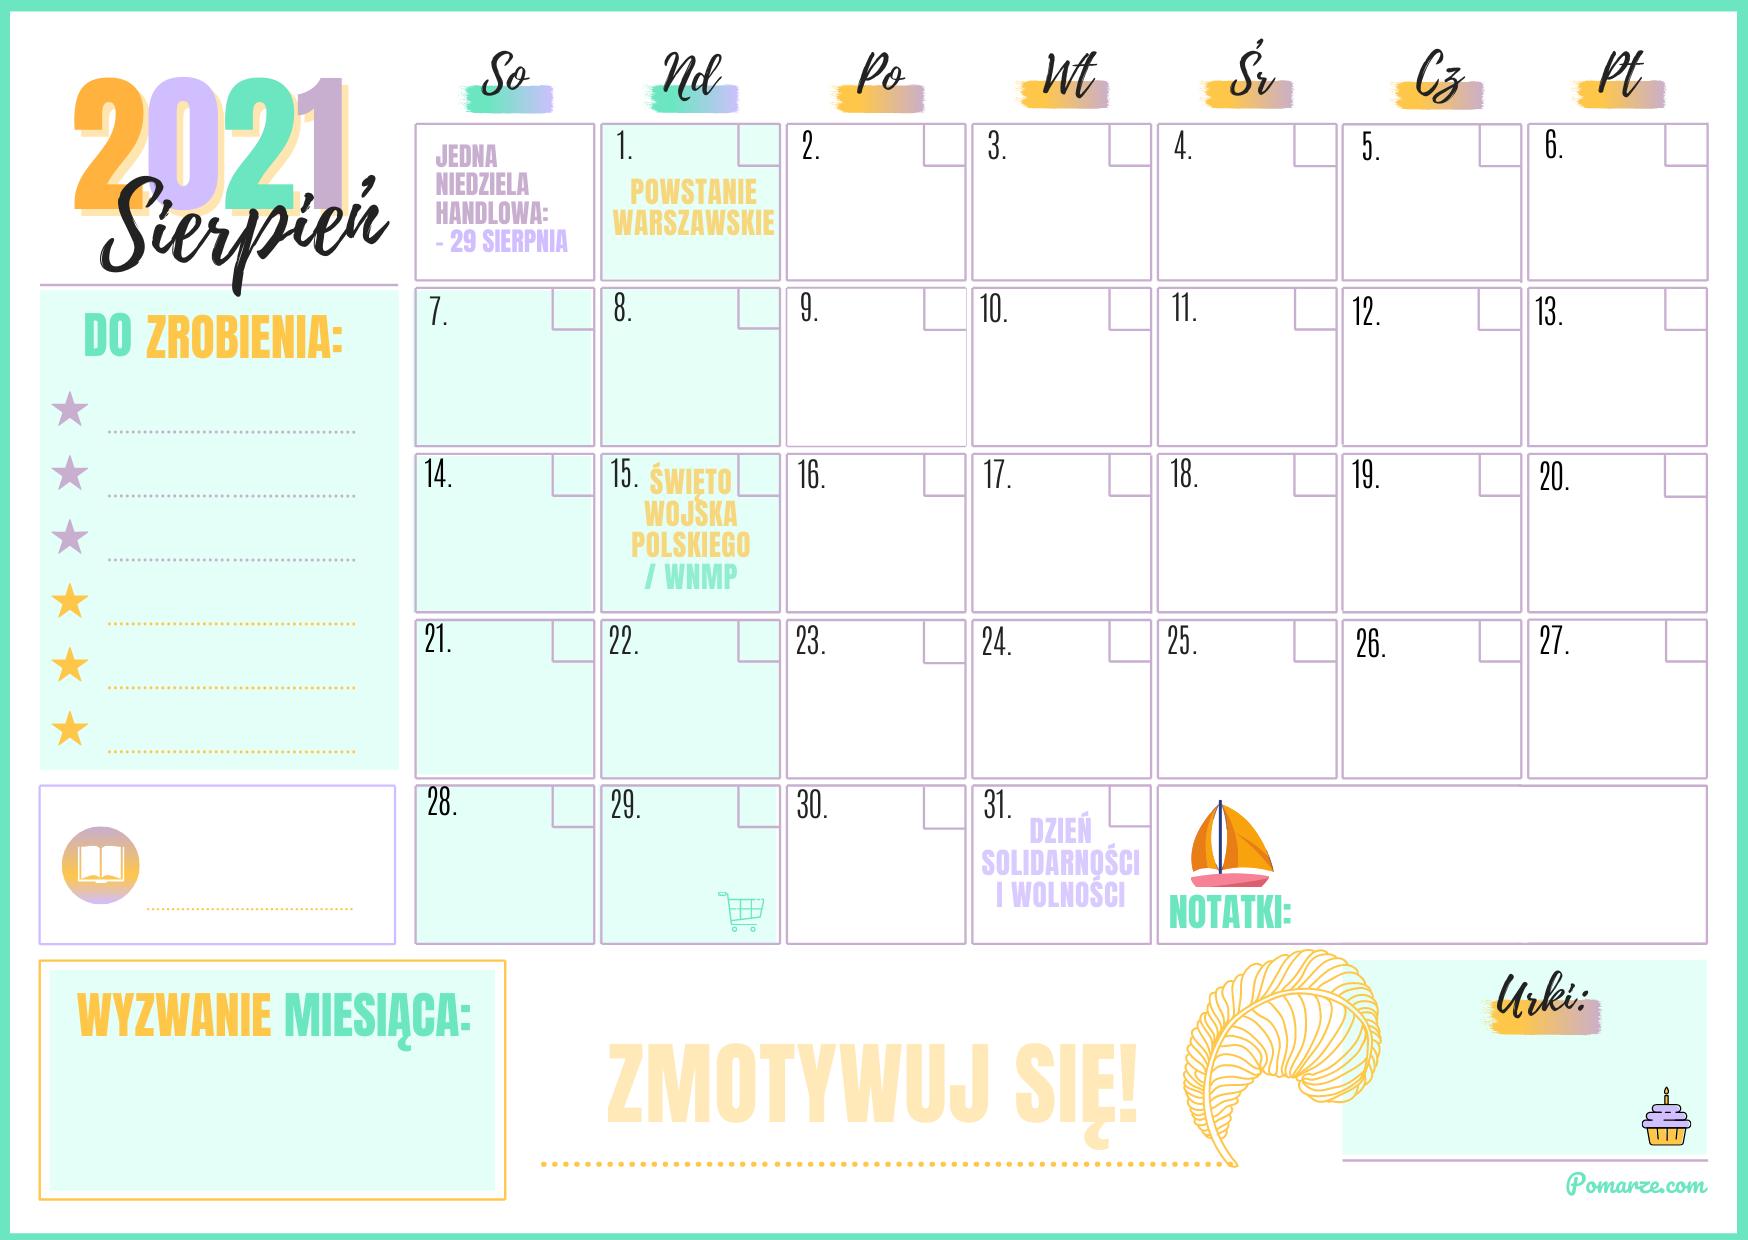 Sierpien Kalendarz miesieczny planer 2021 błękitny druk